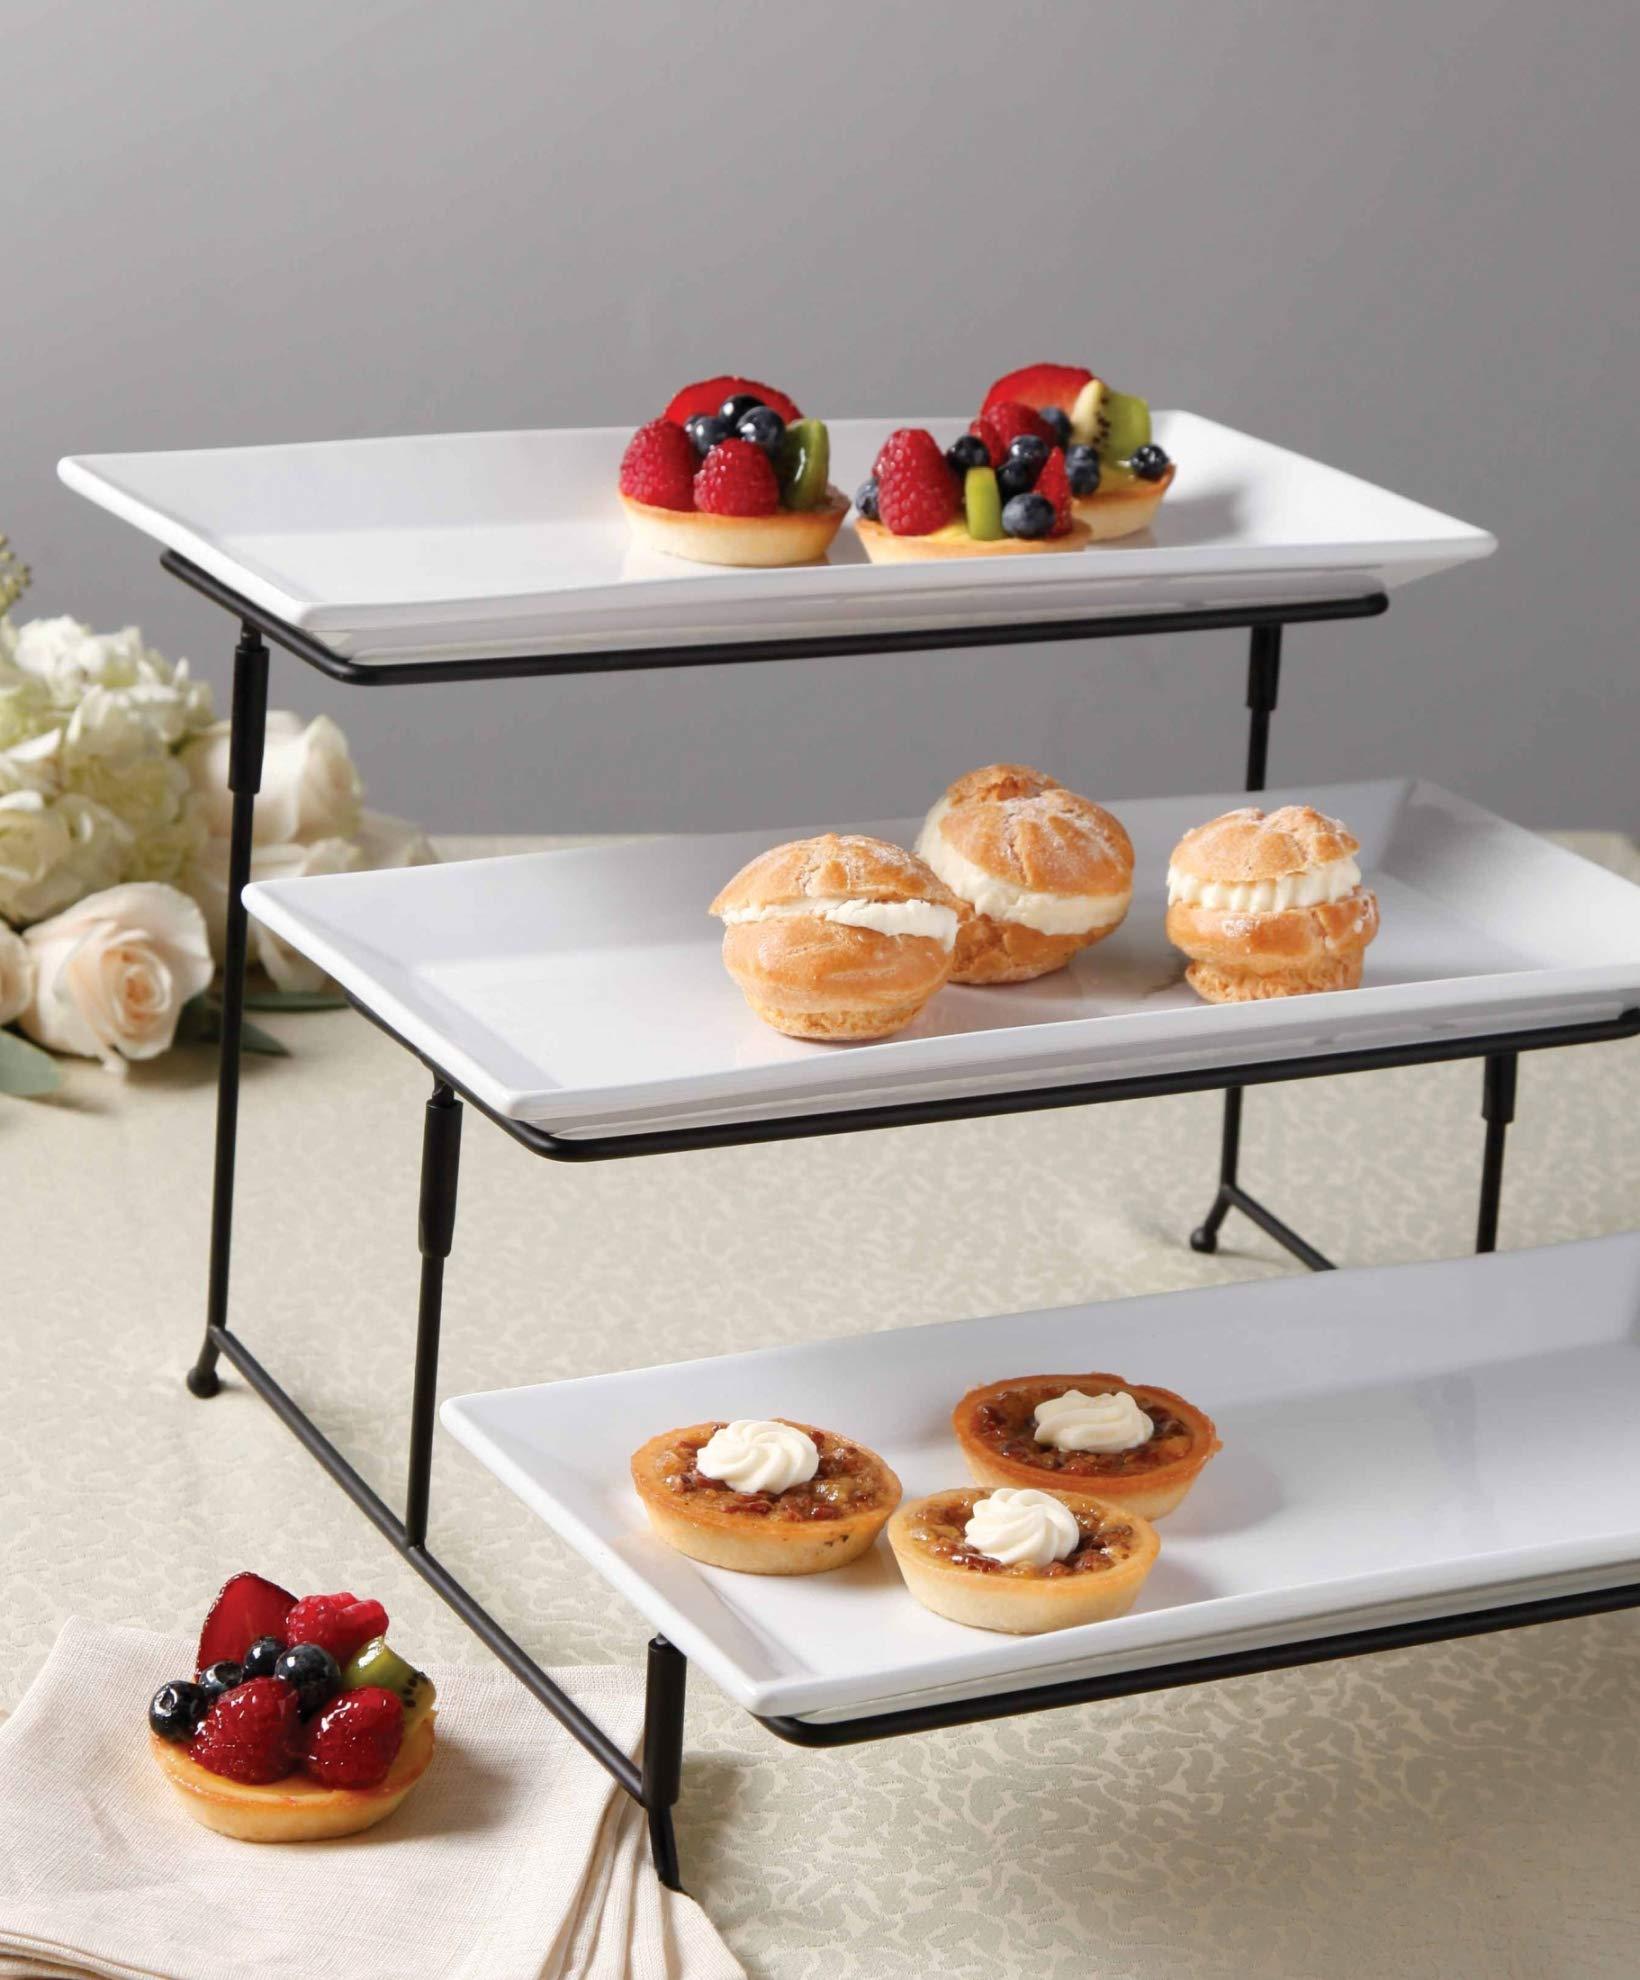 Graciousi Dining Three-Tier Rectangular Plate Set, White And Black